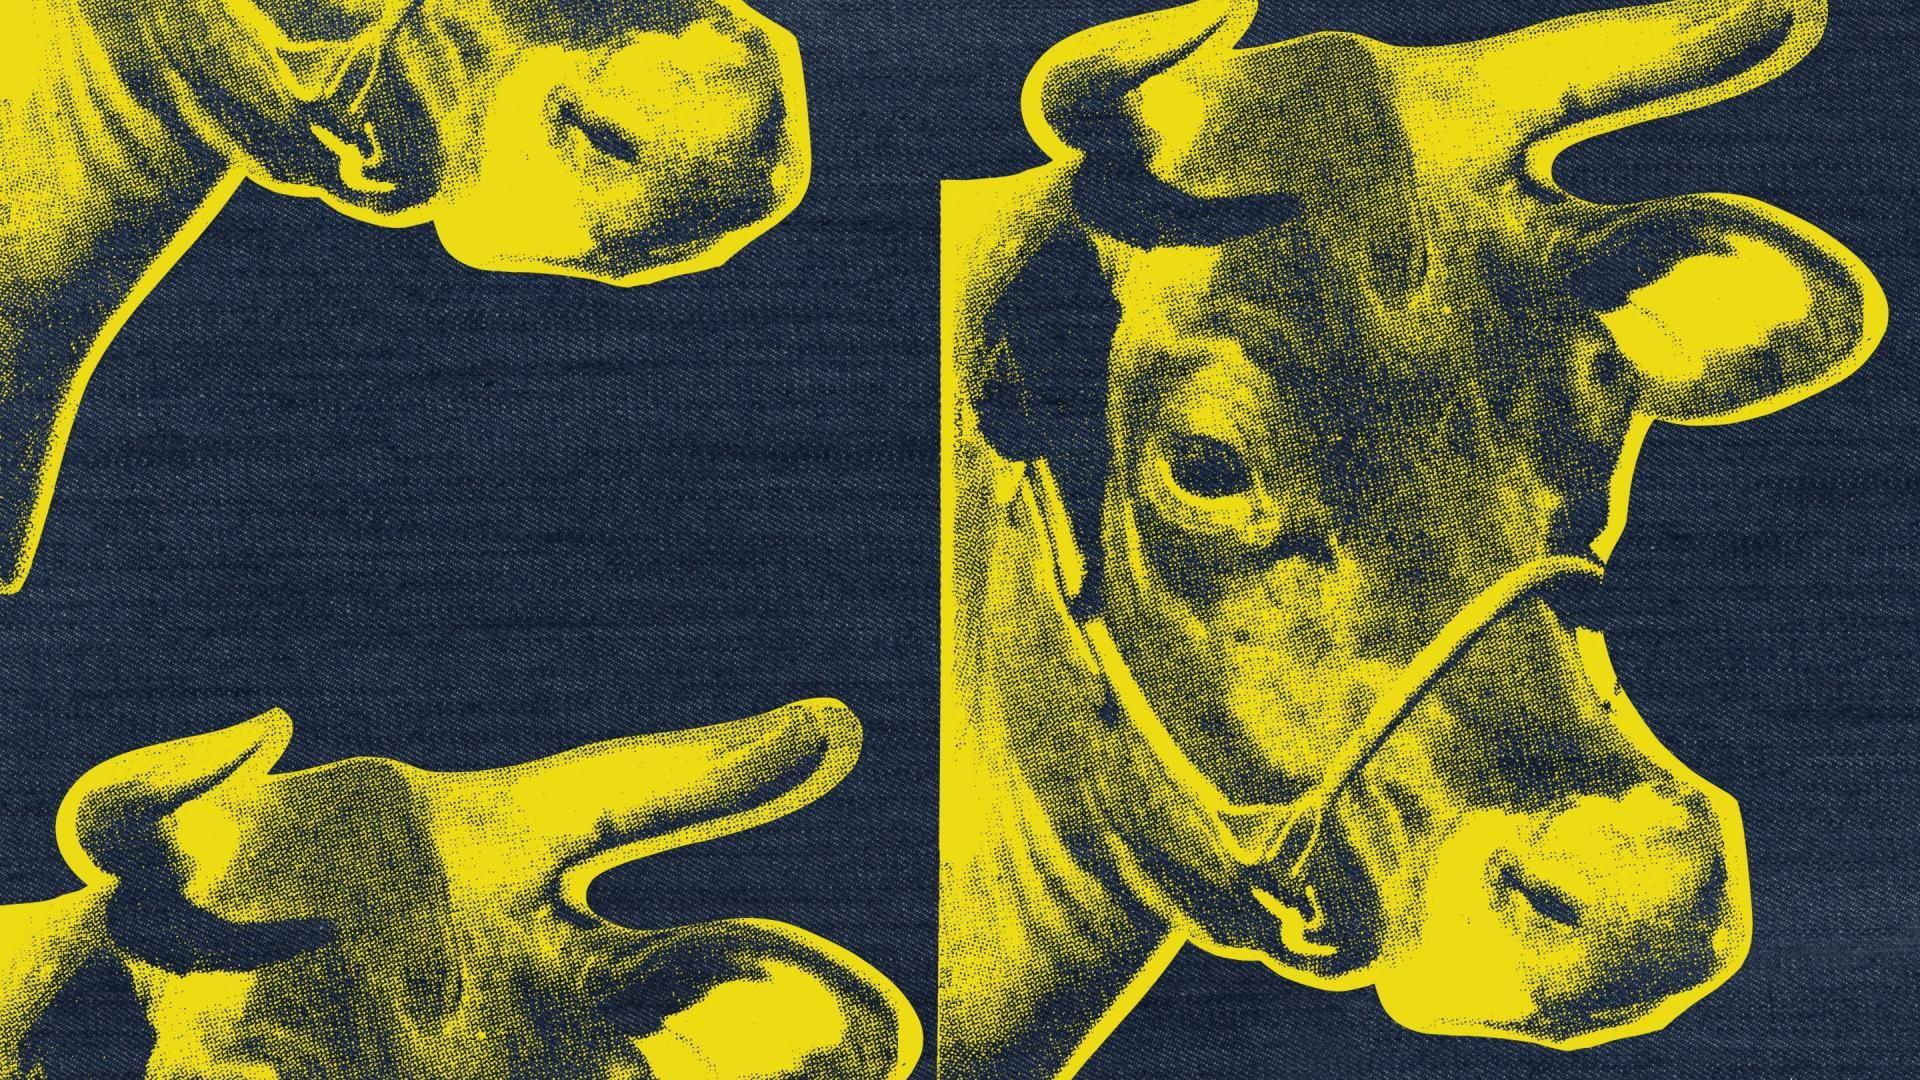 Andy Warhol Cow Wallpaper DFILES 681×498 Warhol Cow